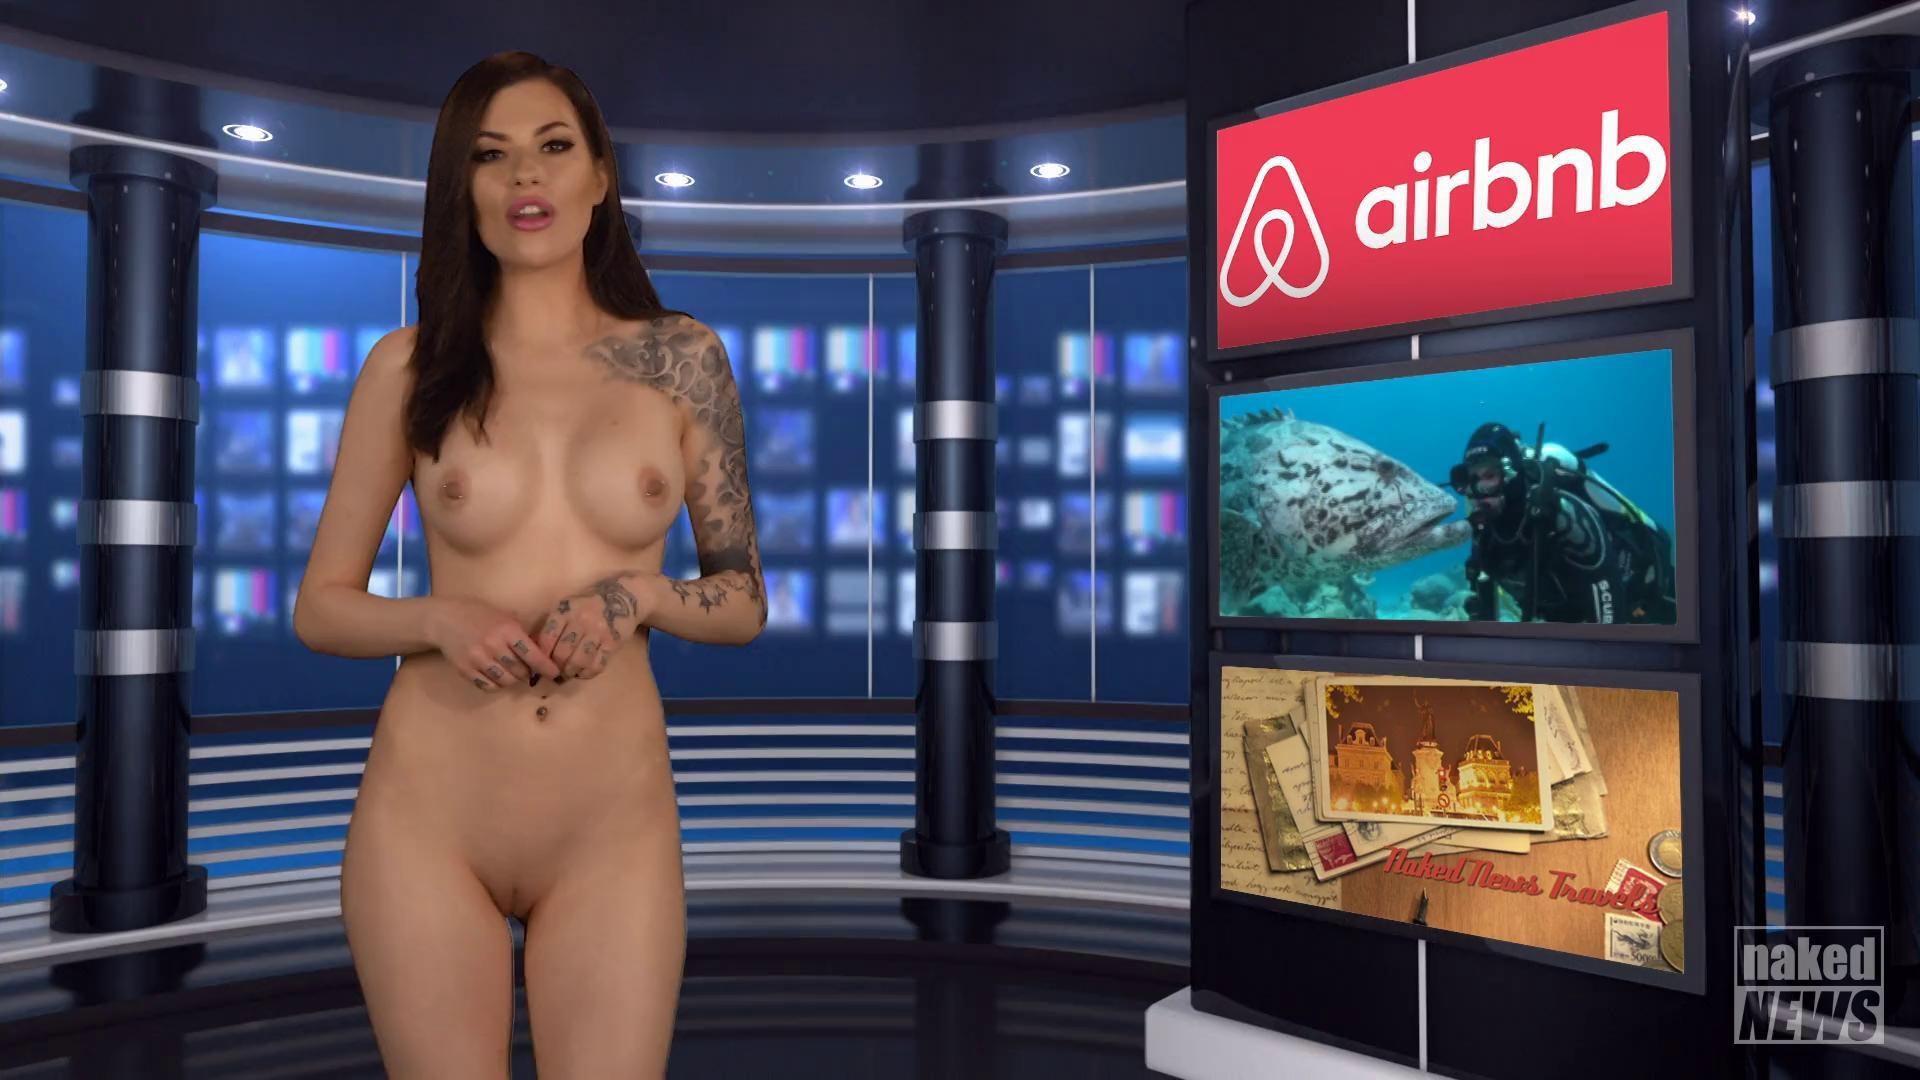 Japanese naked news anchors